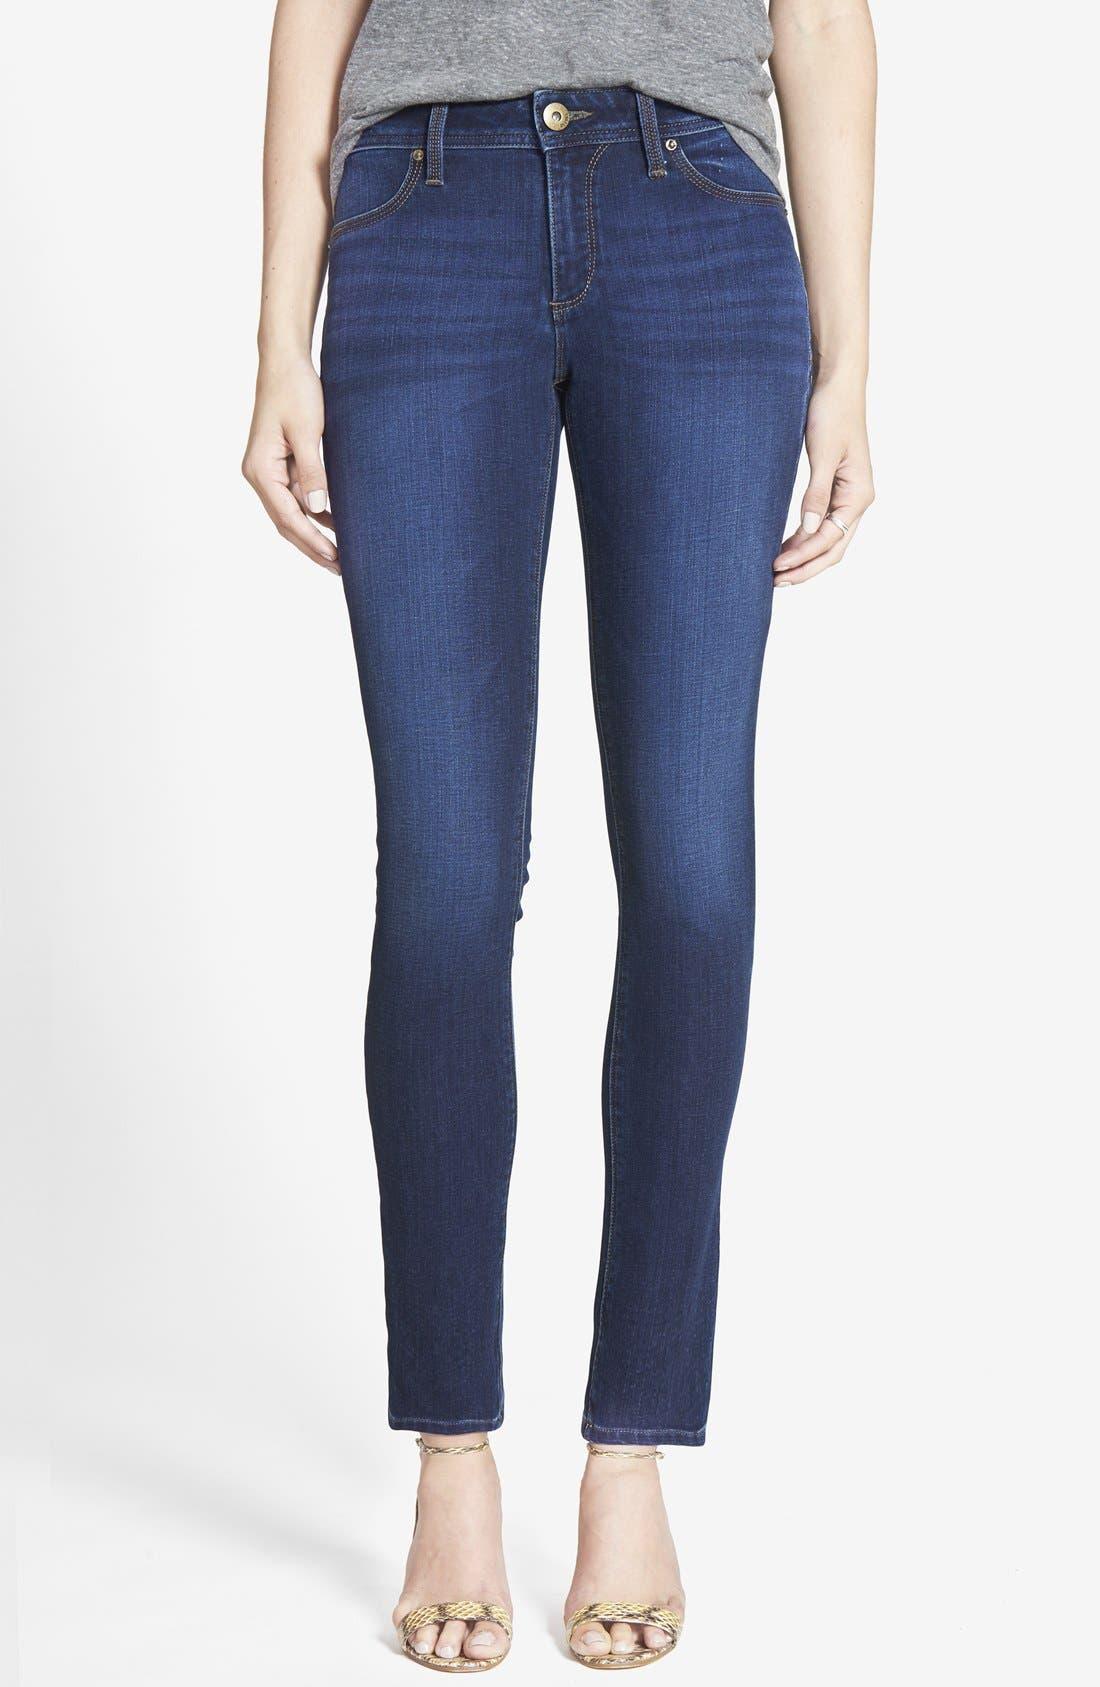 Alternate Image 1 Selected - DL1961 'Emma' Power Legging Jeans (Albany)